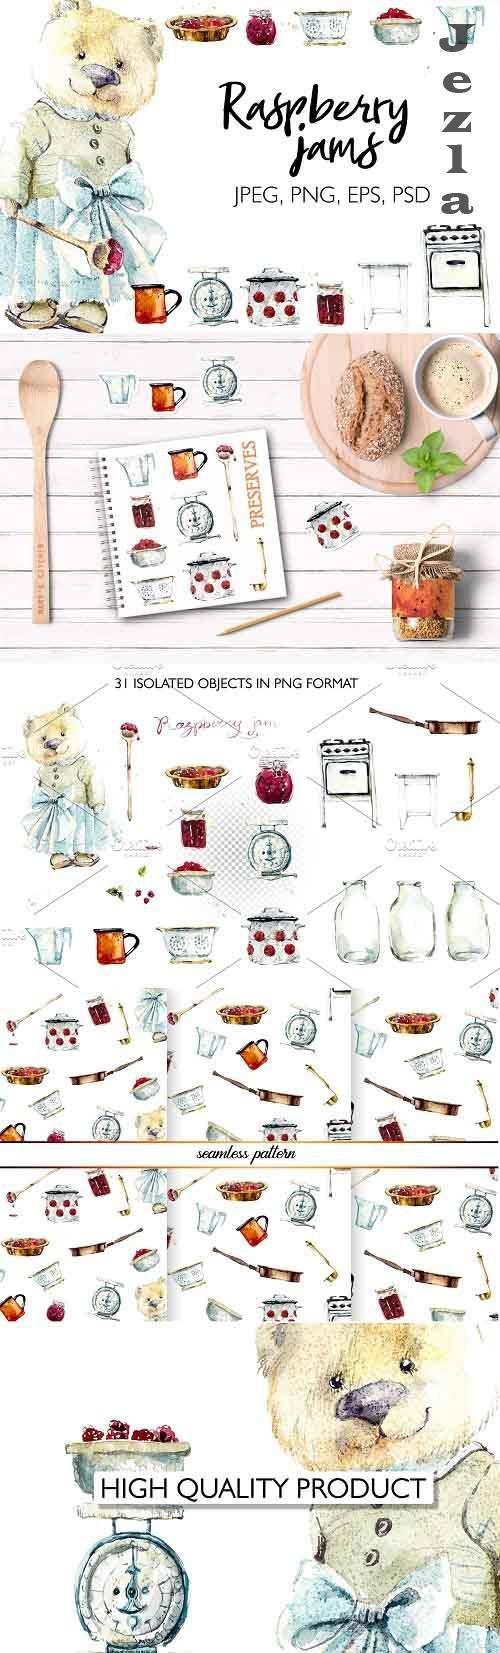 Watercolor raspberry jam - 4044966